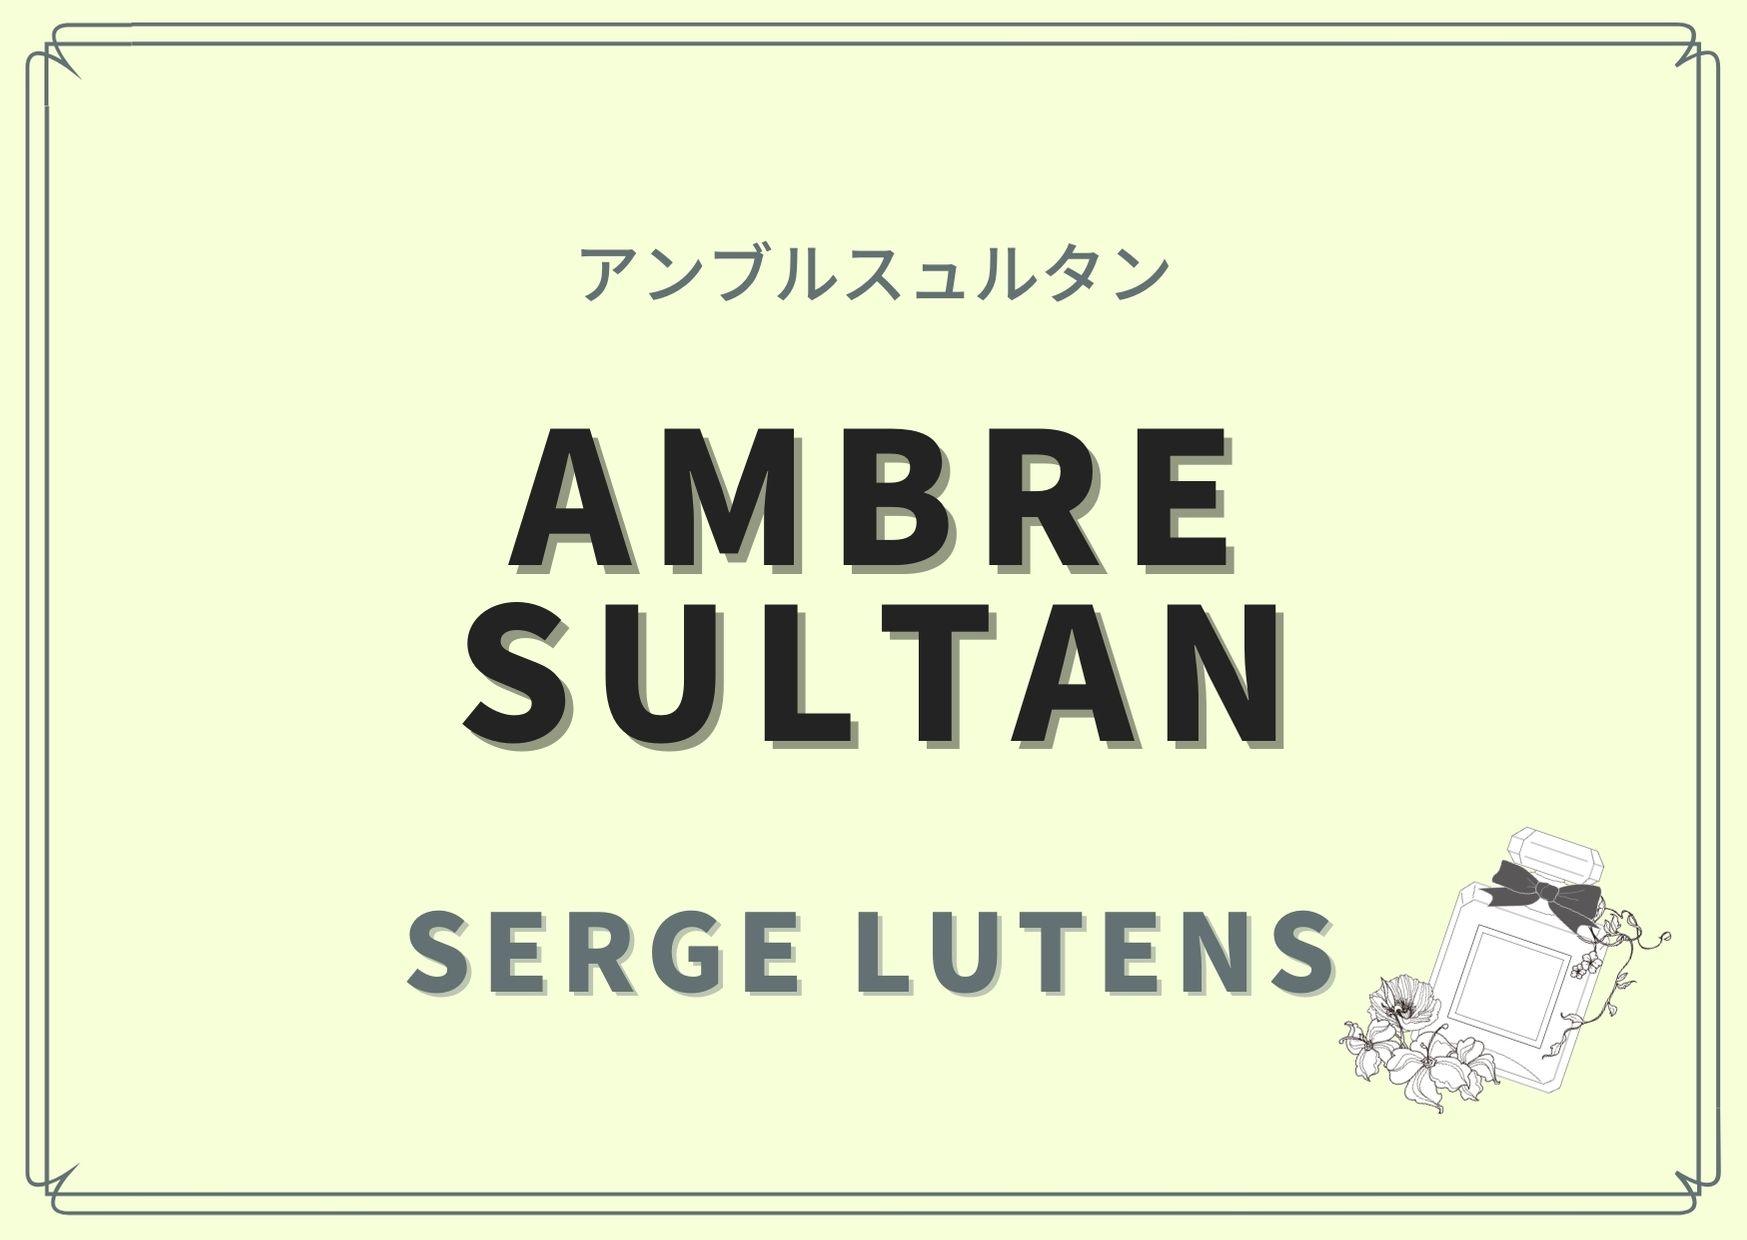 Ambre sultan(アンブルスュルタン)/SERGE LUTENS(セルジュ ルタンス)